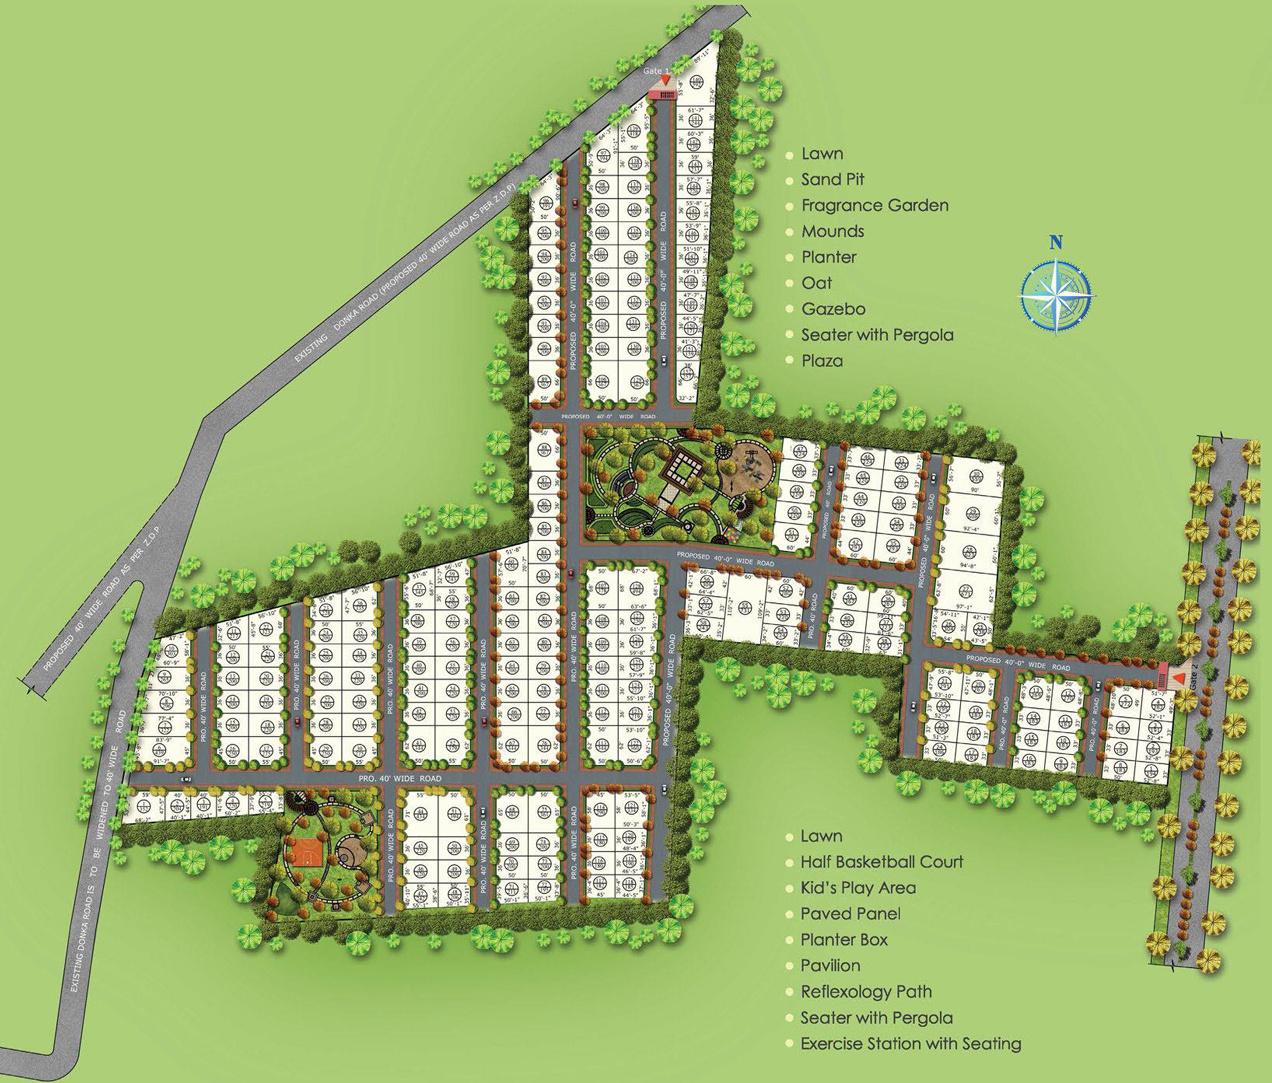 2880 Sq Ft Plot For Sale In Vertex Homes Capital Vista